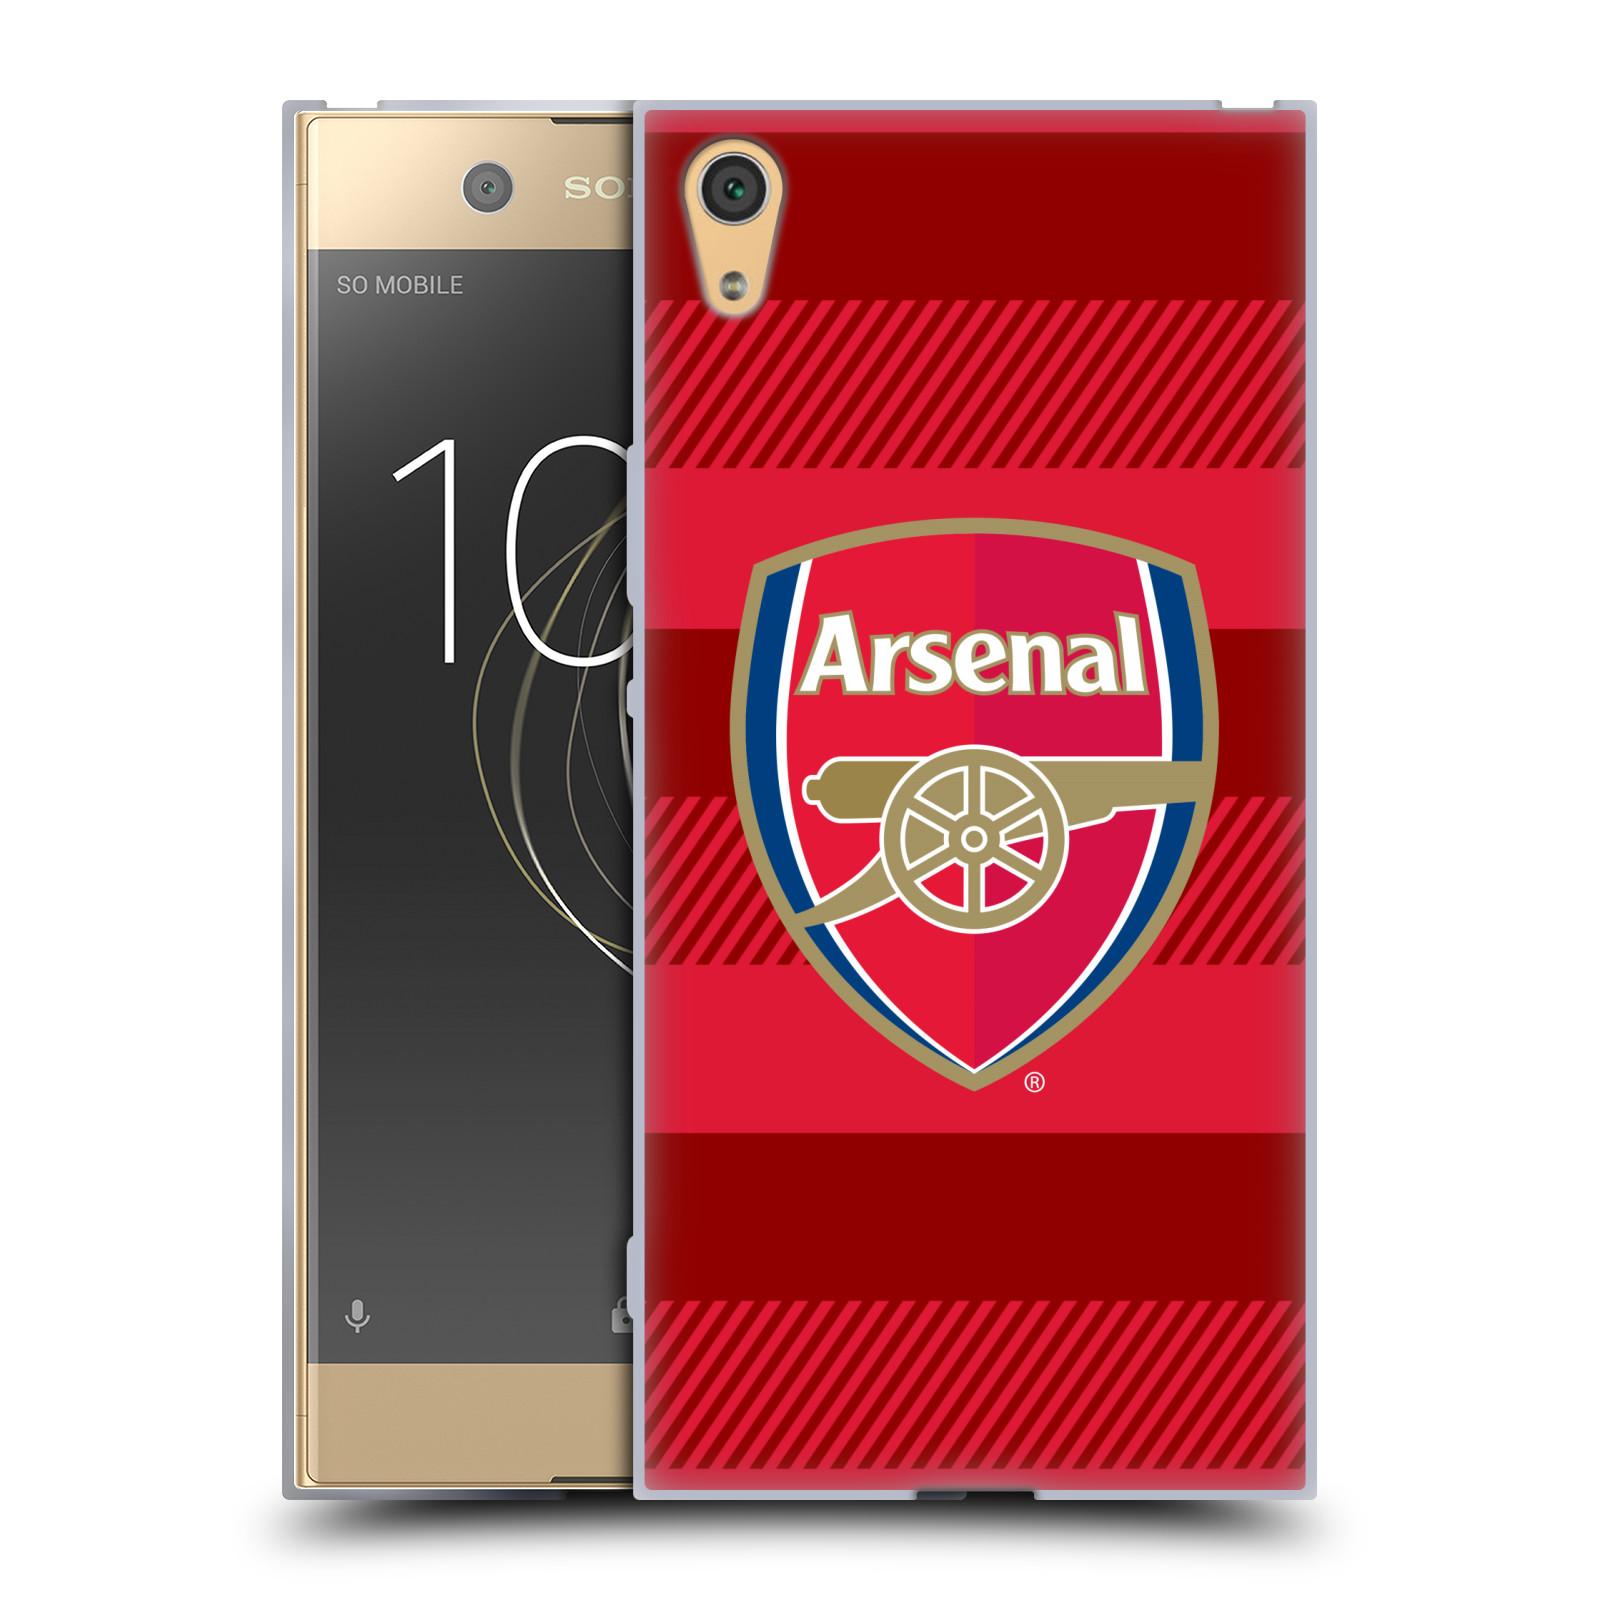 Silikonové pouzdro na mobil Sony Xperia XA1 Ultra - Head Case - Arsenal FC - Logo s pruhy